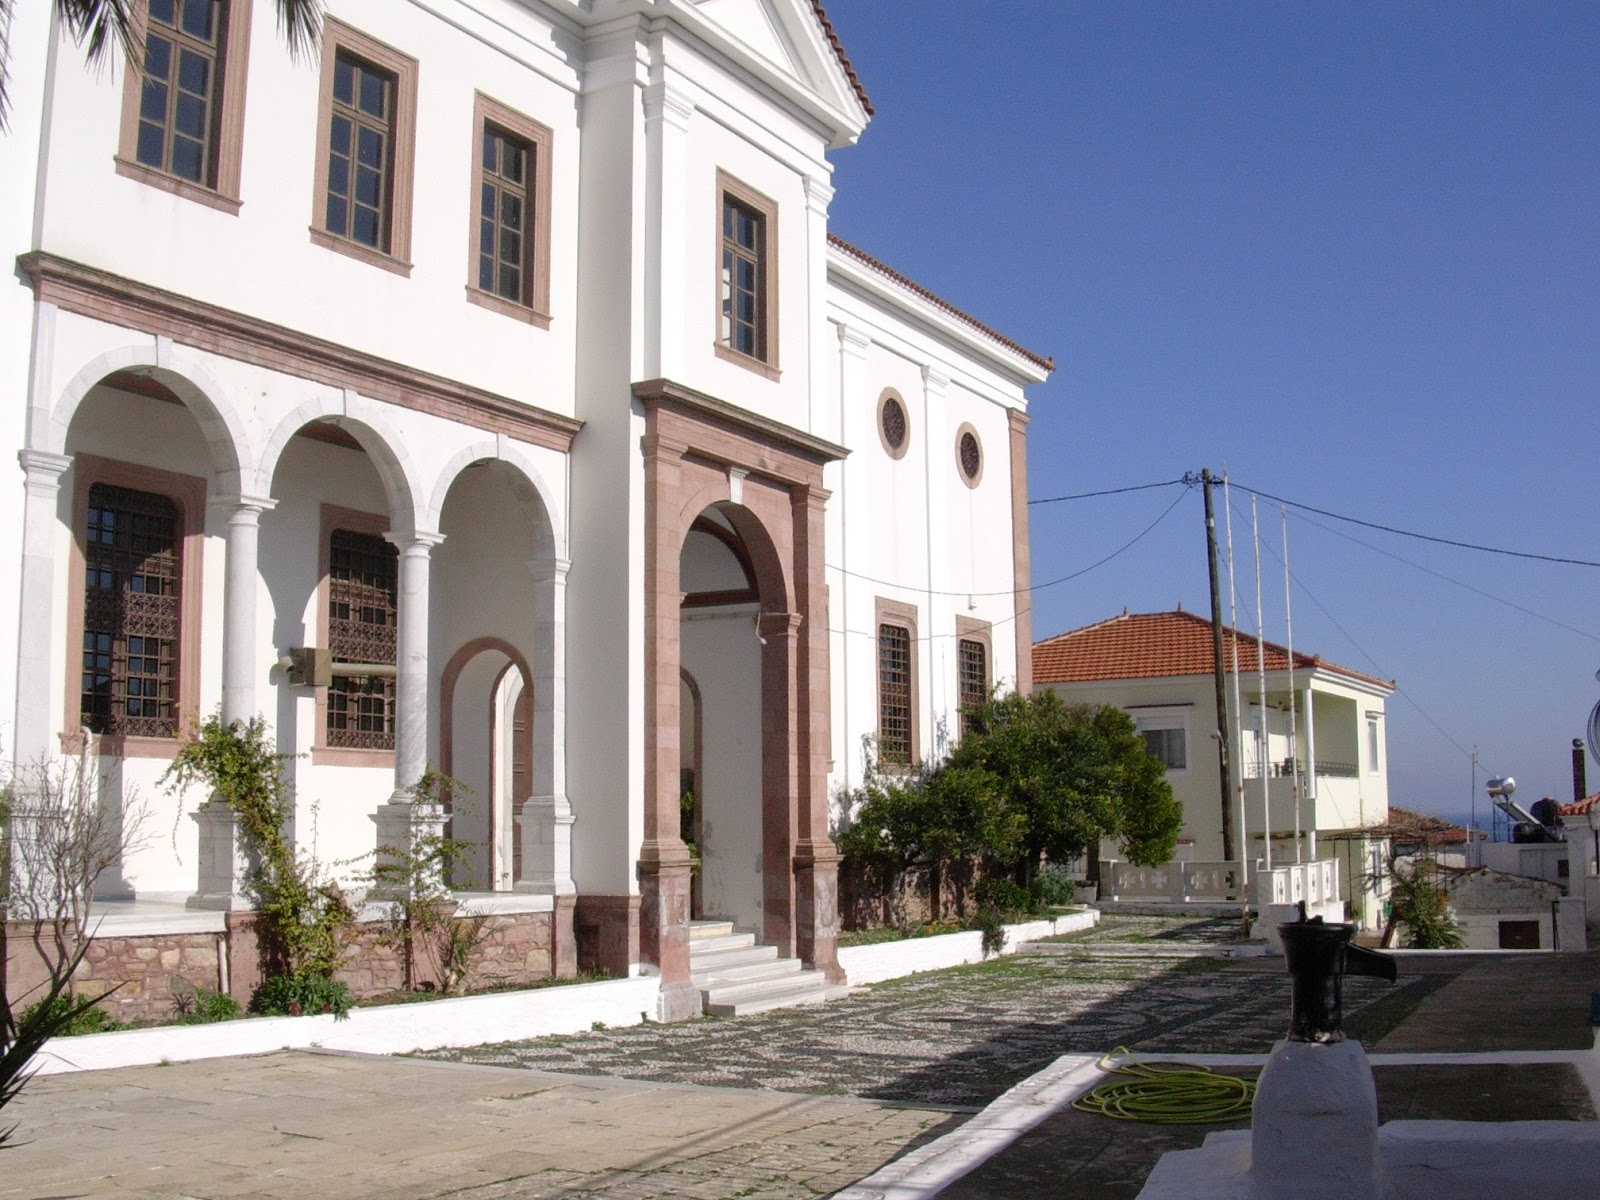 719421a635c2 ΠΑΜΦΙΛΑ  Ιερός Ναός Αγίας Βαρβάρας Παμφίλων Μέρος 2ο - Αρχιτεκτονική ...